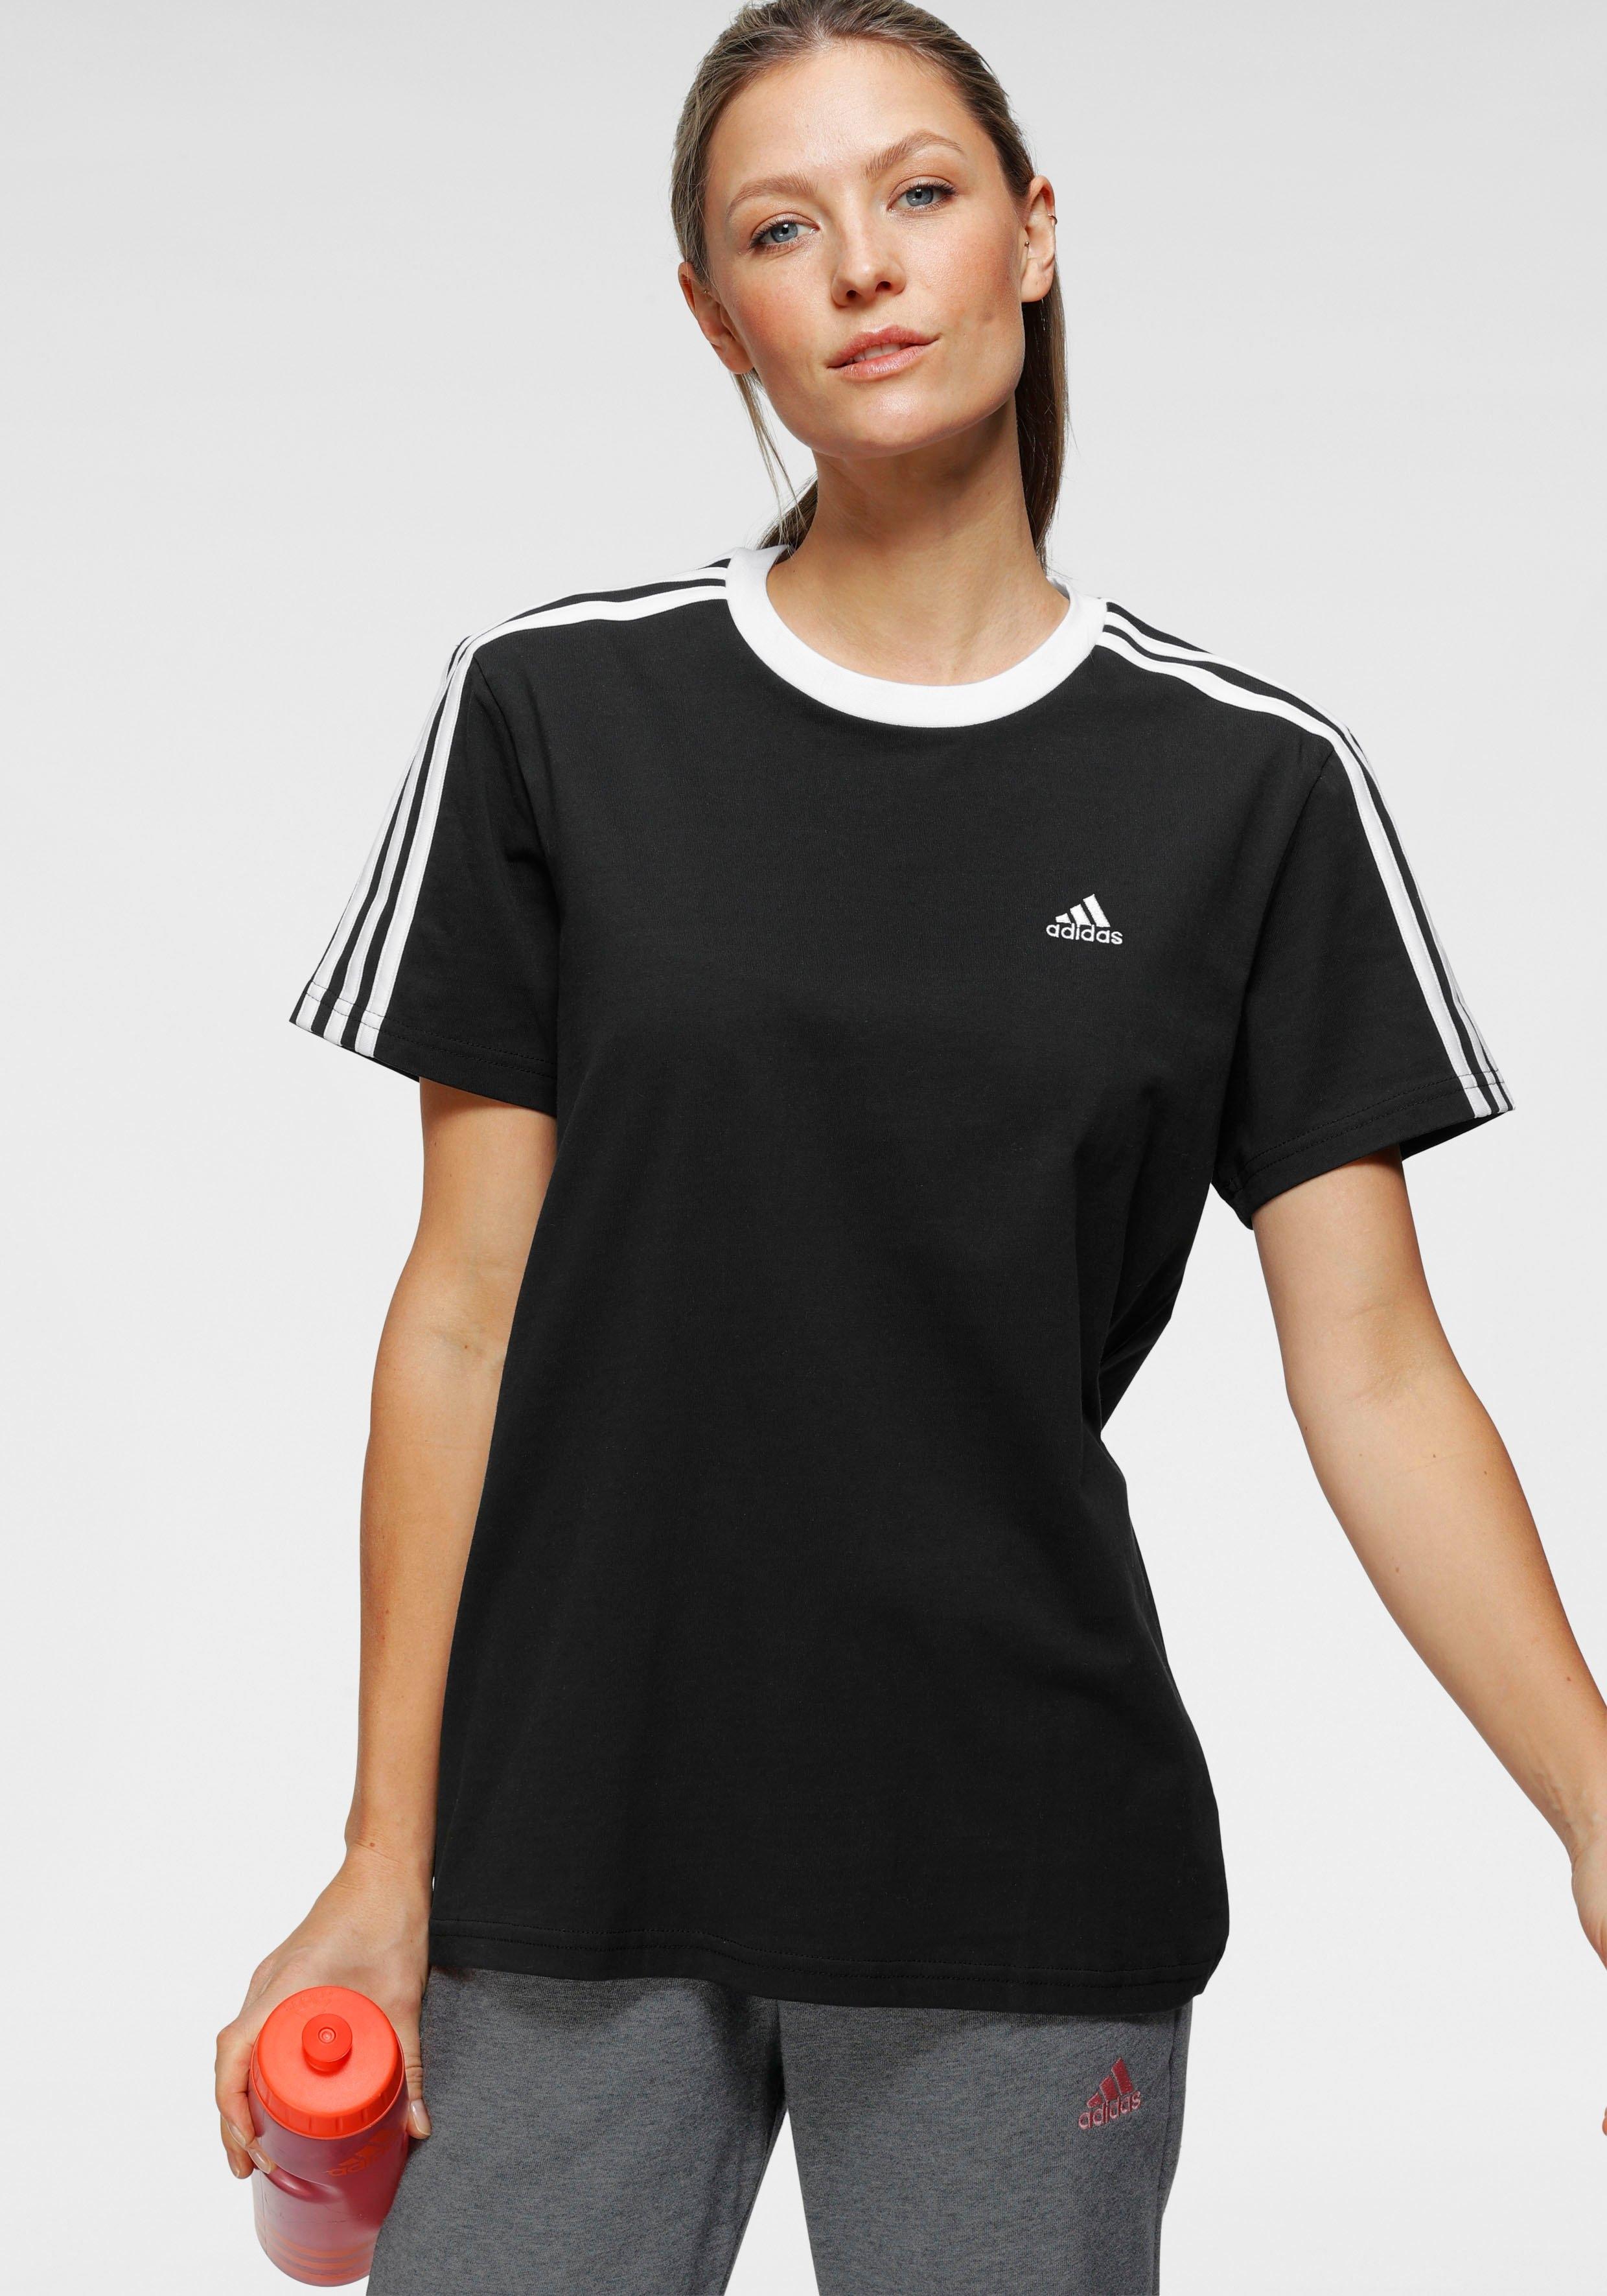 adidas Performance T-shirt ESSENTIALS 3-STRIPES T-SHIRT bij OTTO online kopen